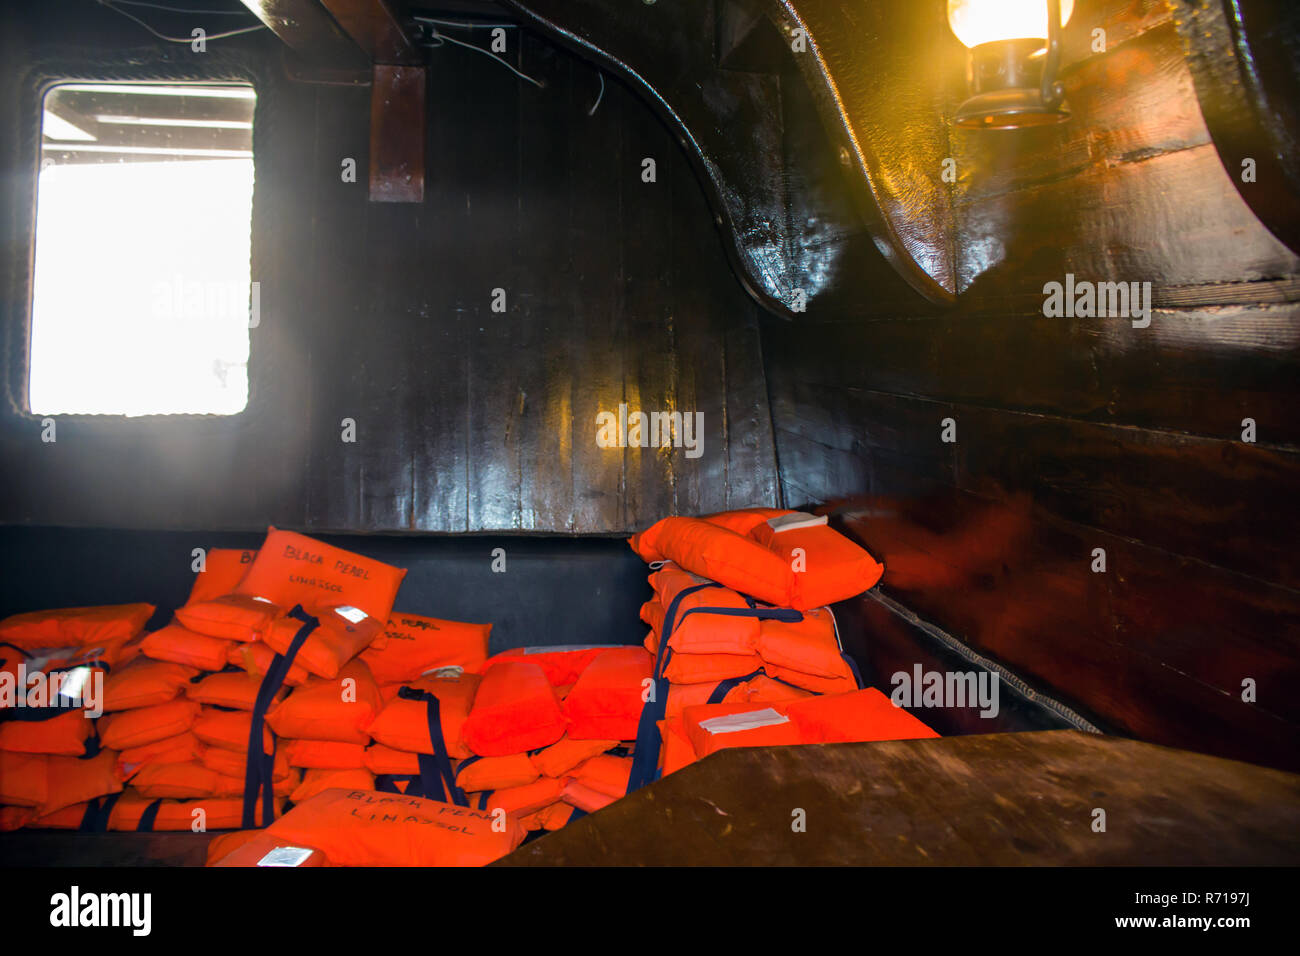 orange life vest on wooden background - Stock Image